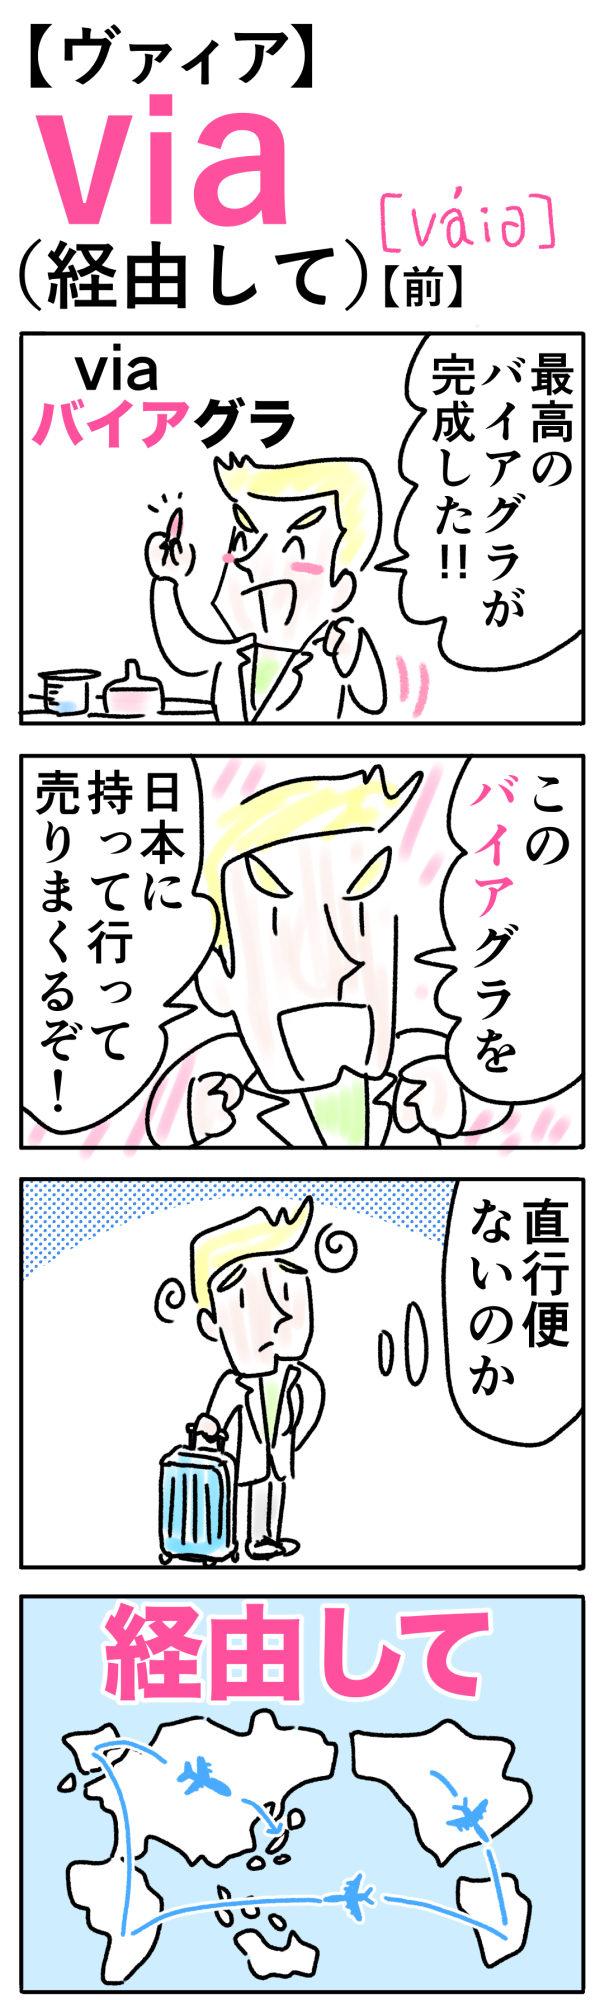 via(経由して)の語呂合わせ英単語